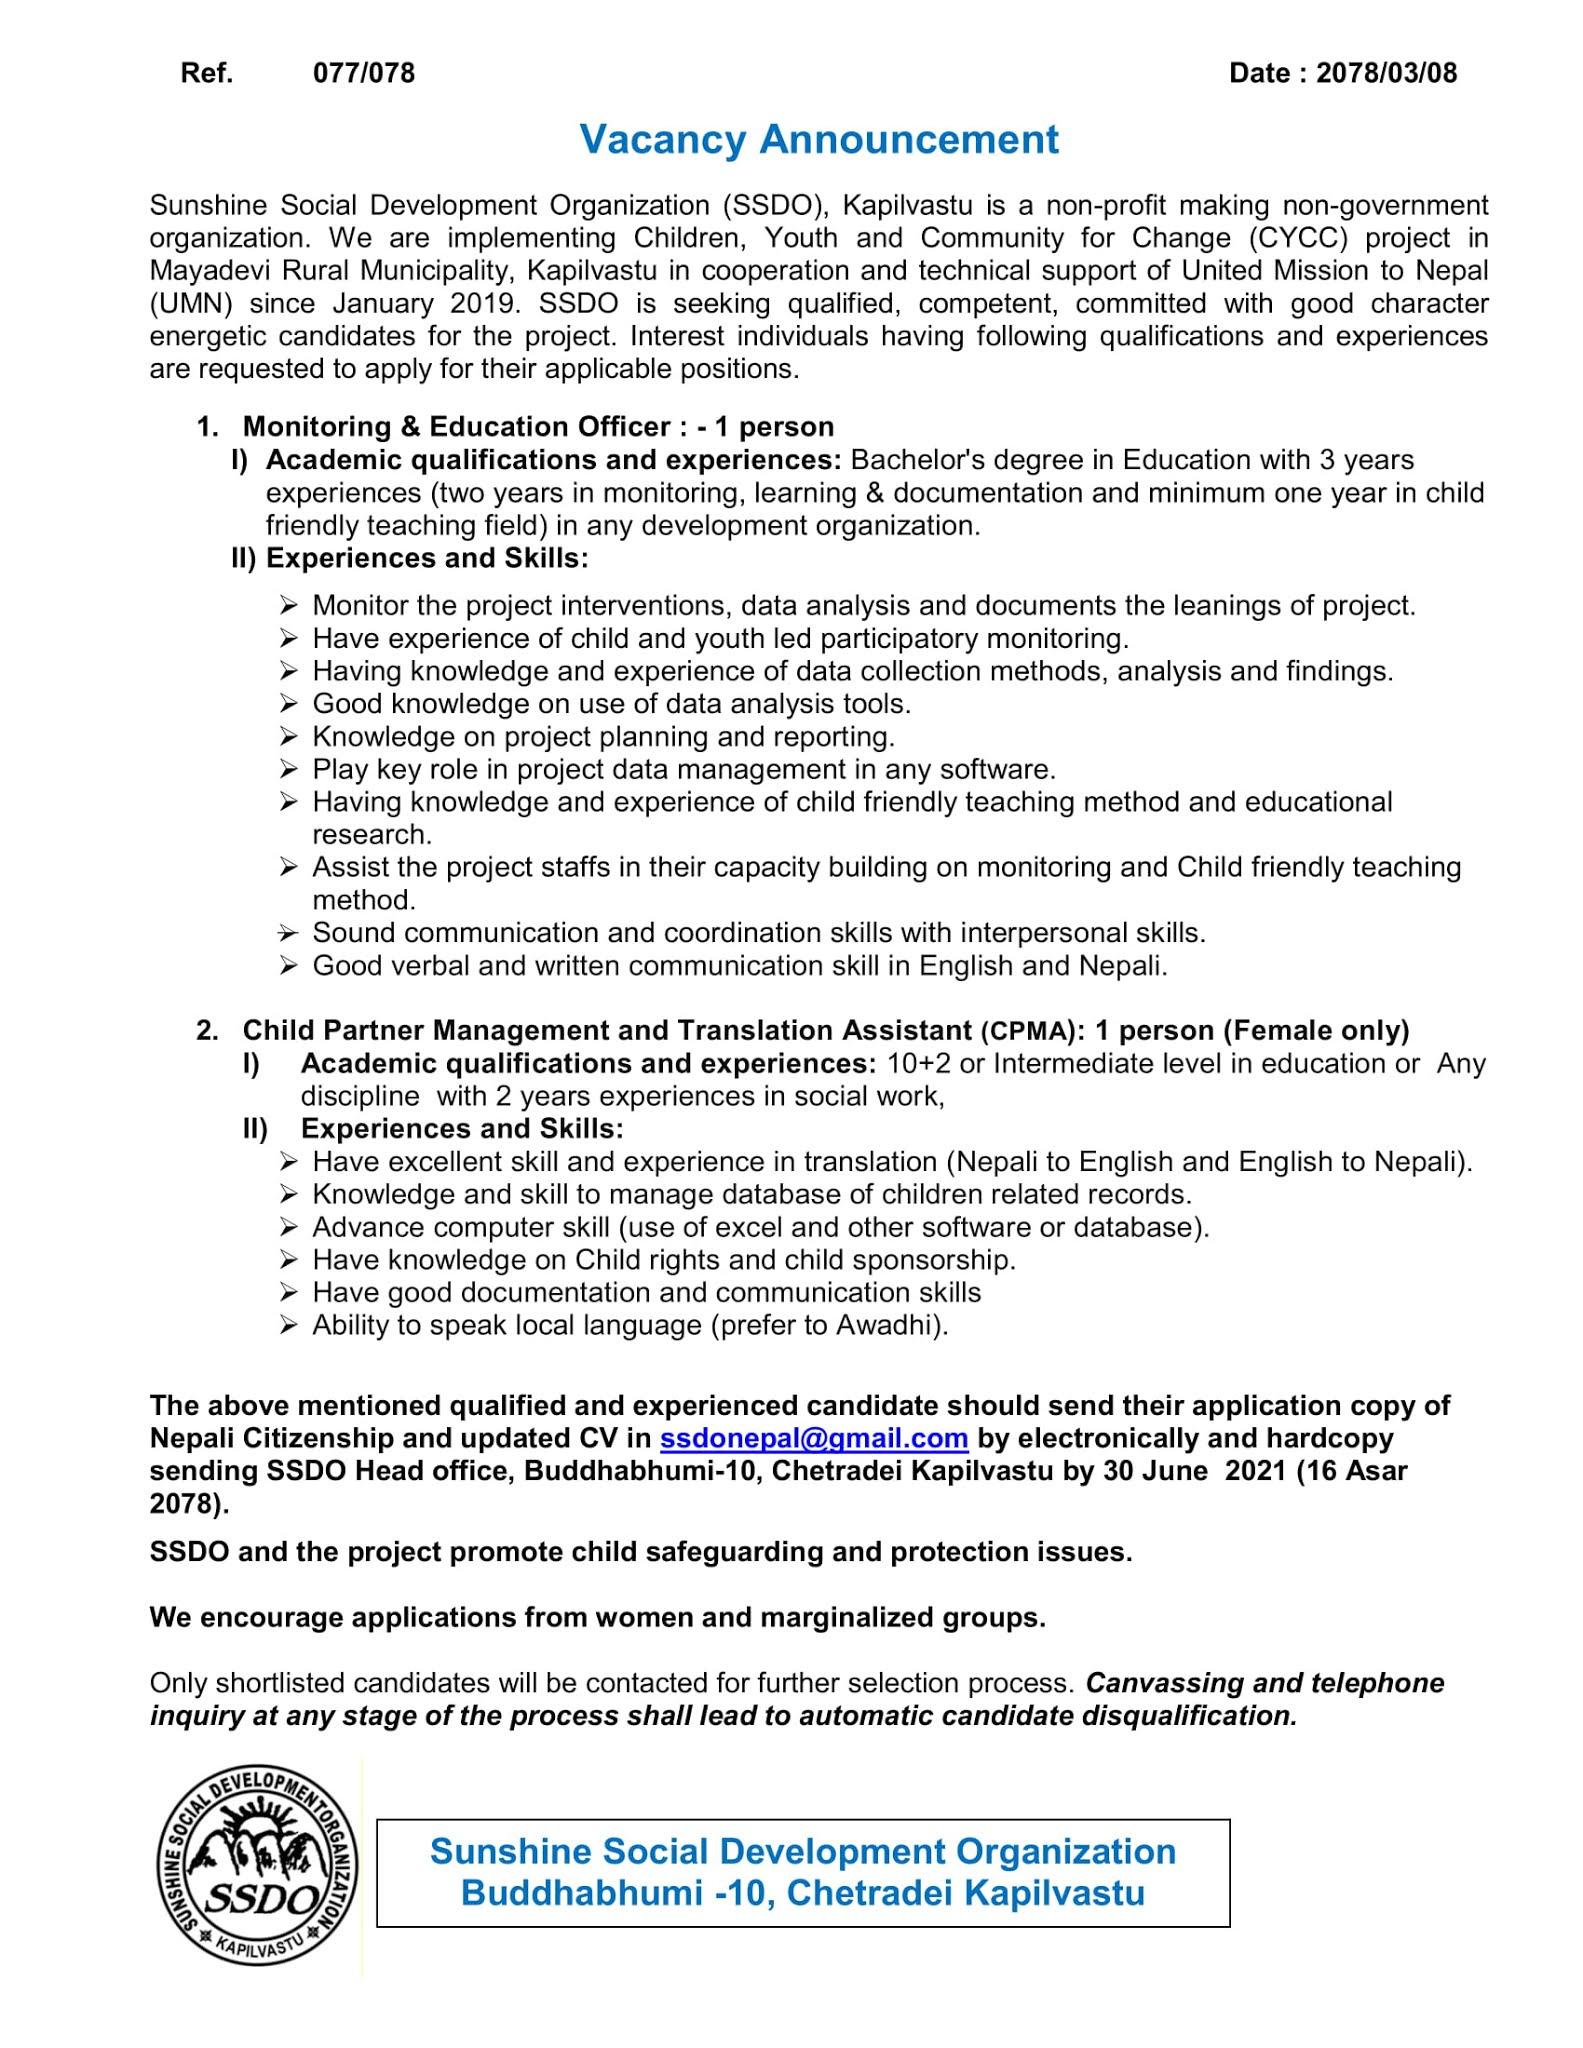 Sunshine Social Development Organization  Job Vacancy for MEO and CPMA